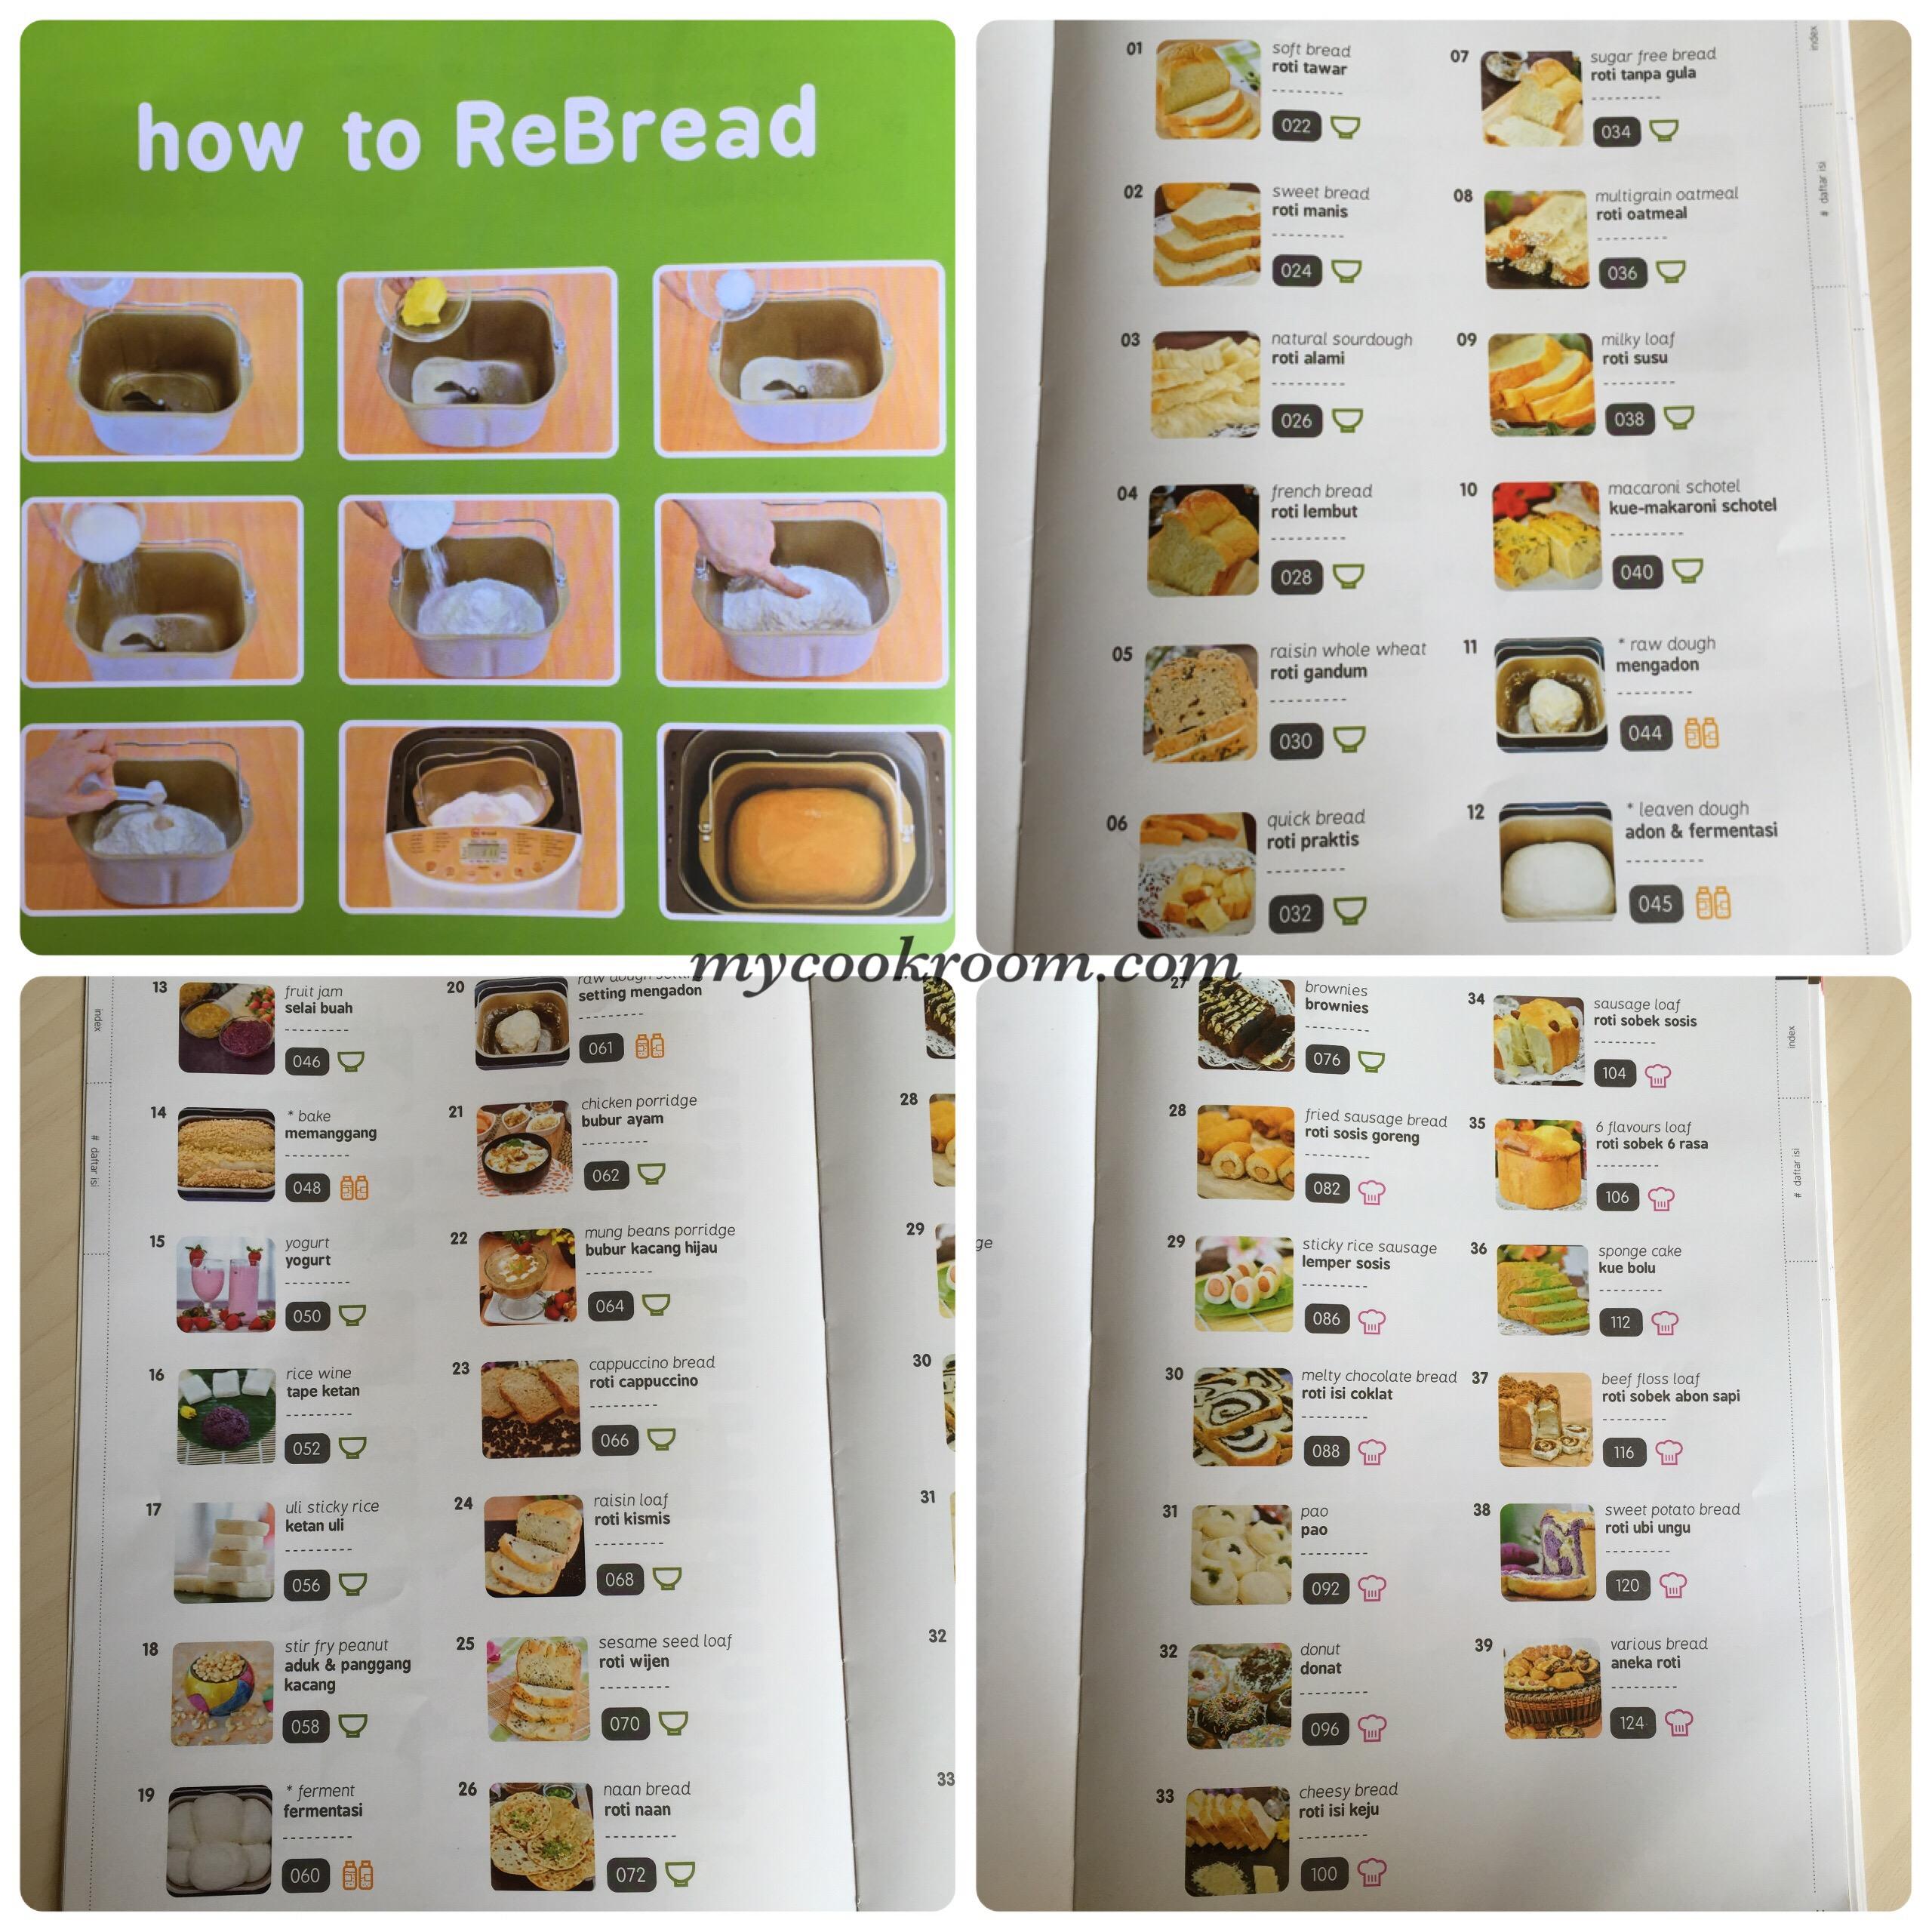 Bread Maker Re Review Metyas Cook Room Oxone Rice Cooker Ox820n B Daftar Isi Buku